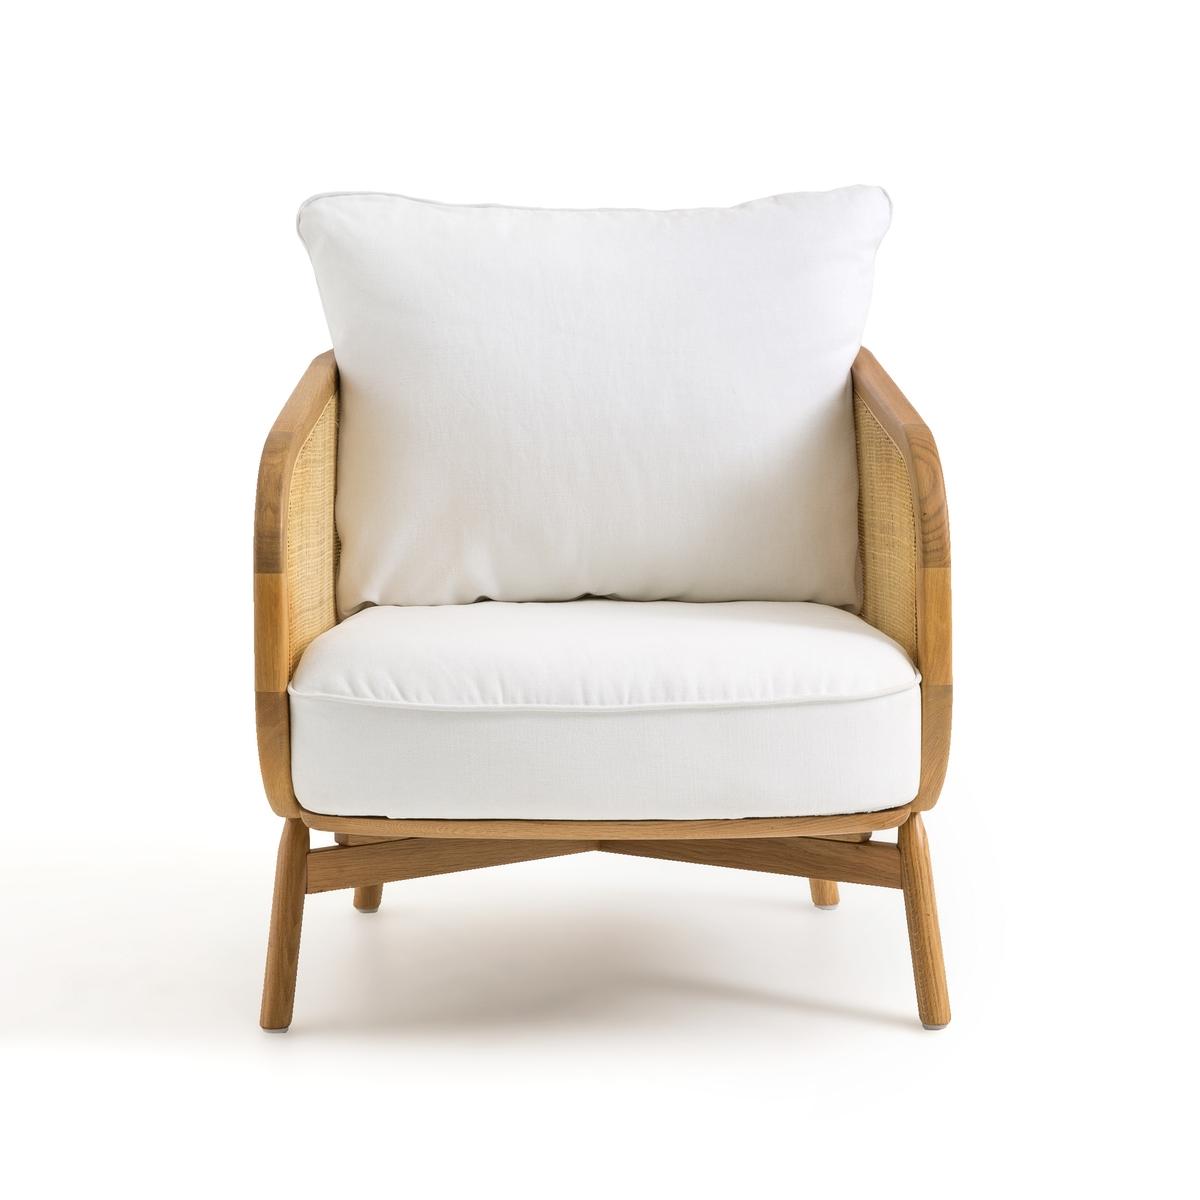 Кресло LaRedoute Cornelius дизайн - Э Галлина единый размер белый